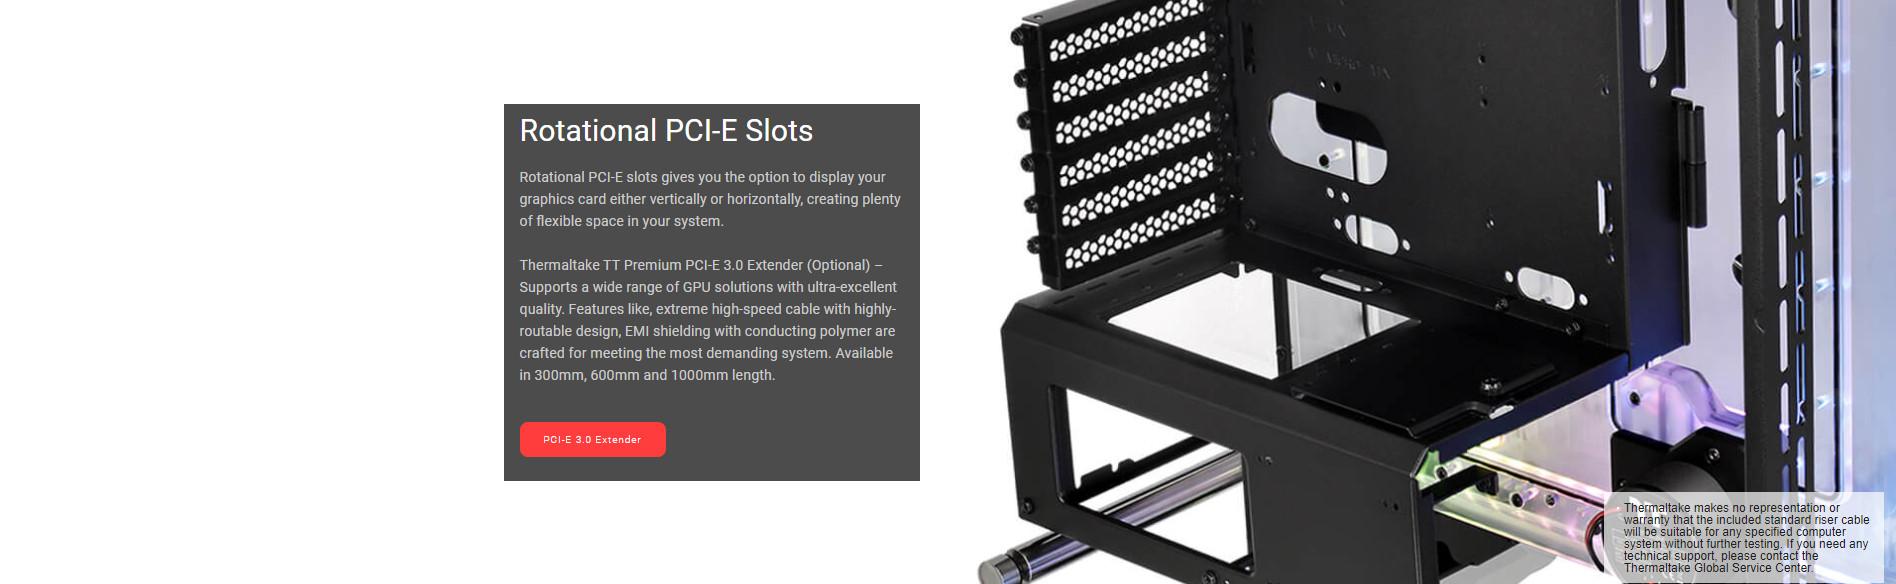 Vỏ Case Thermaltake DistroCase 350P Mid Tower Chassis với khe PCI có khả năng xoay dọc